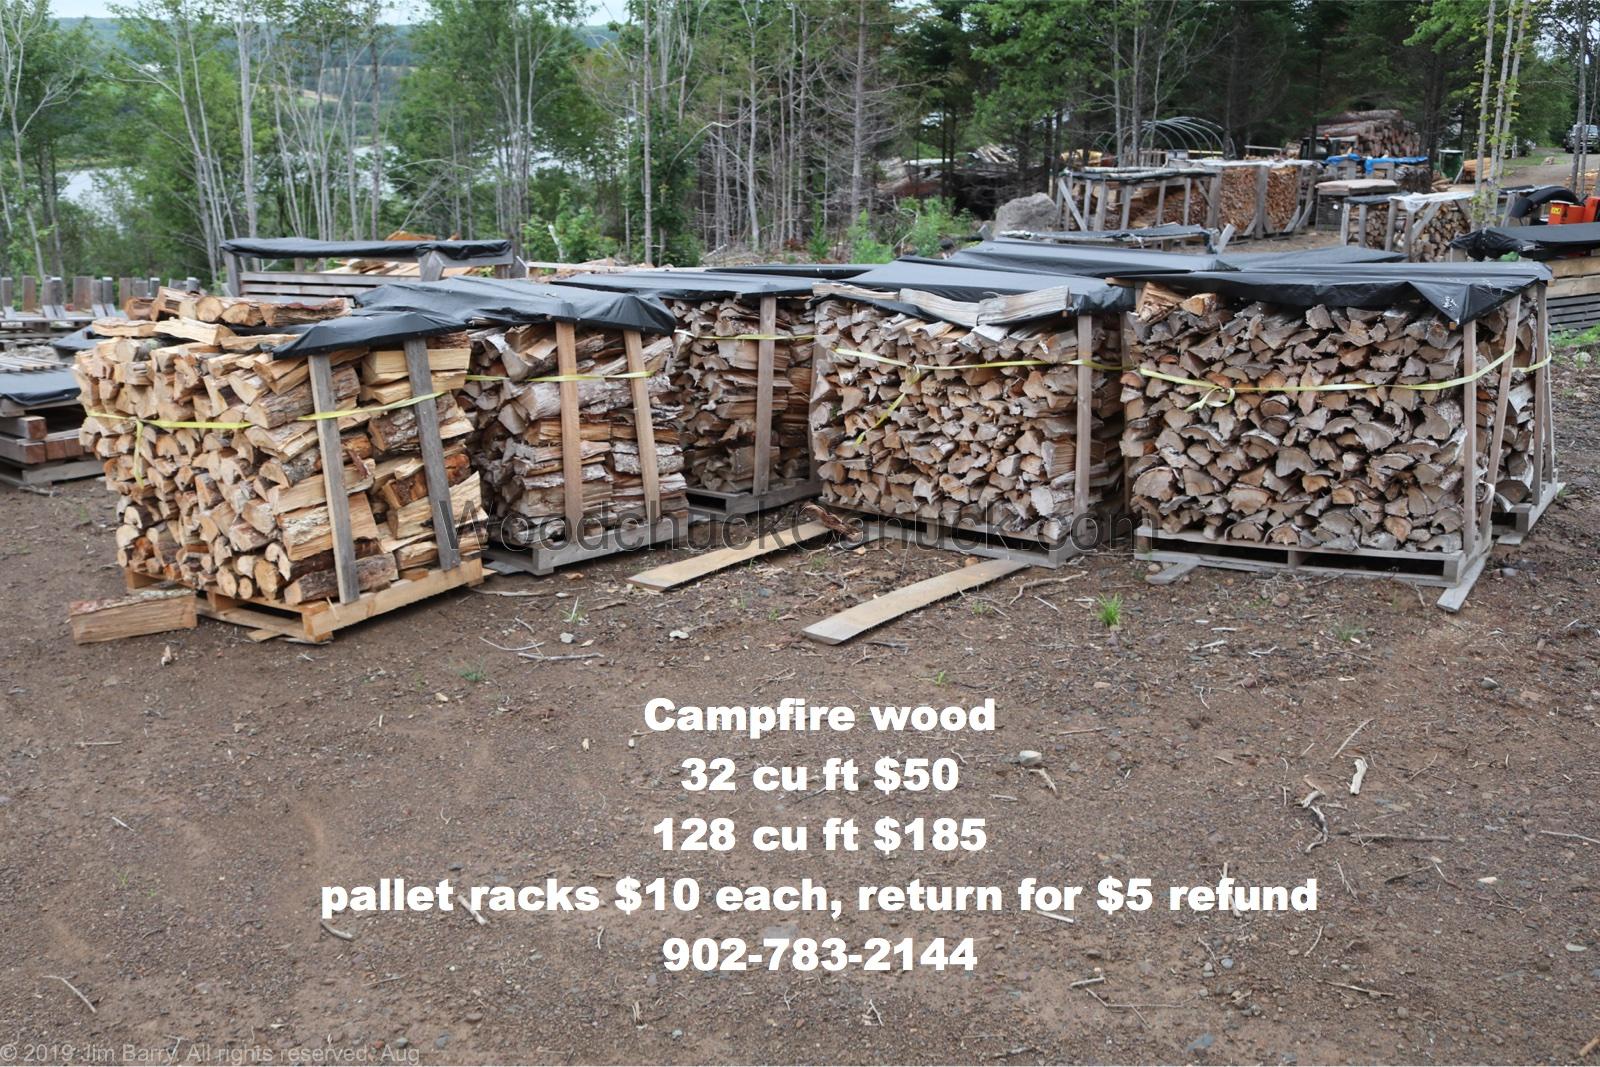 20190820-campfirewood